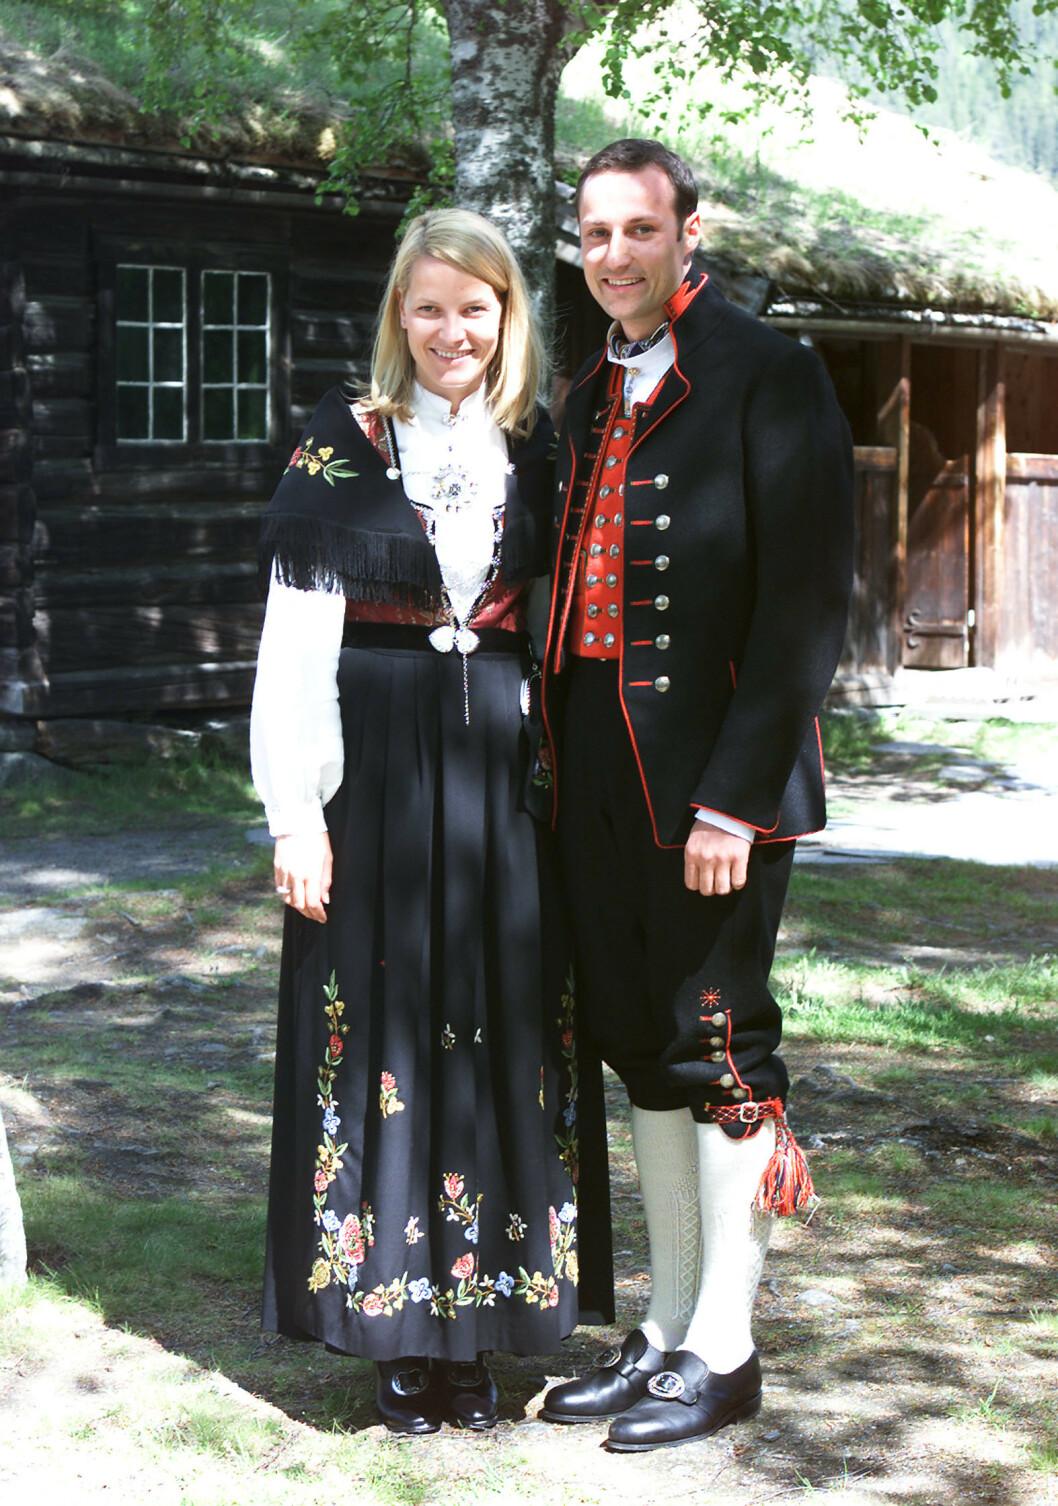 FLOTT PAR: Kronprinsparet fotografert utenfor Valdres Folkemuseum på Fagernes, i anledning museets 100-årsjubileum. Mette-Marit Tjessem Høiby, som hun på denne tiden het ettersom hun ennå ikke hadde giftet seg med kronprinsen, var ikledd rogalandsbunad, mens kronprins Haakon var ikledd Fanabunad. FOTO: NTB Scanpix